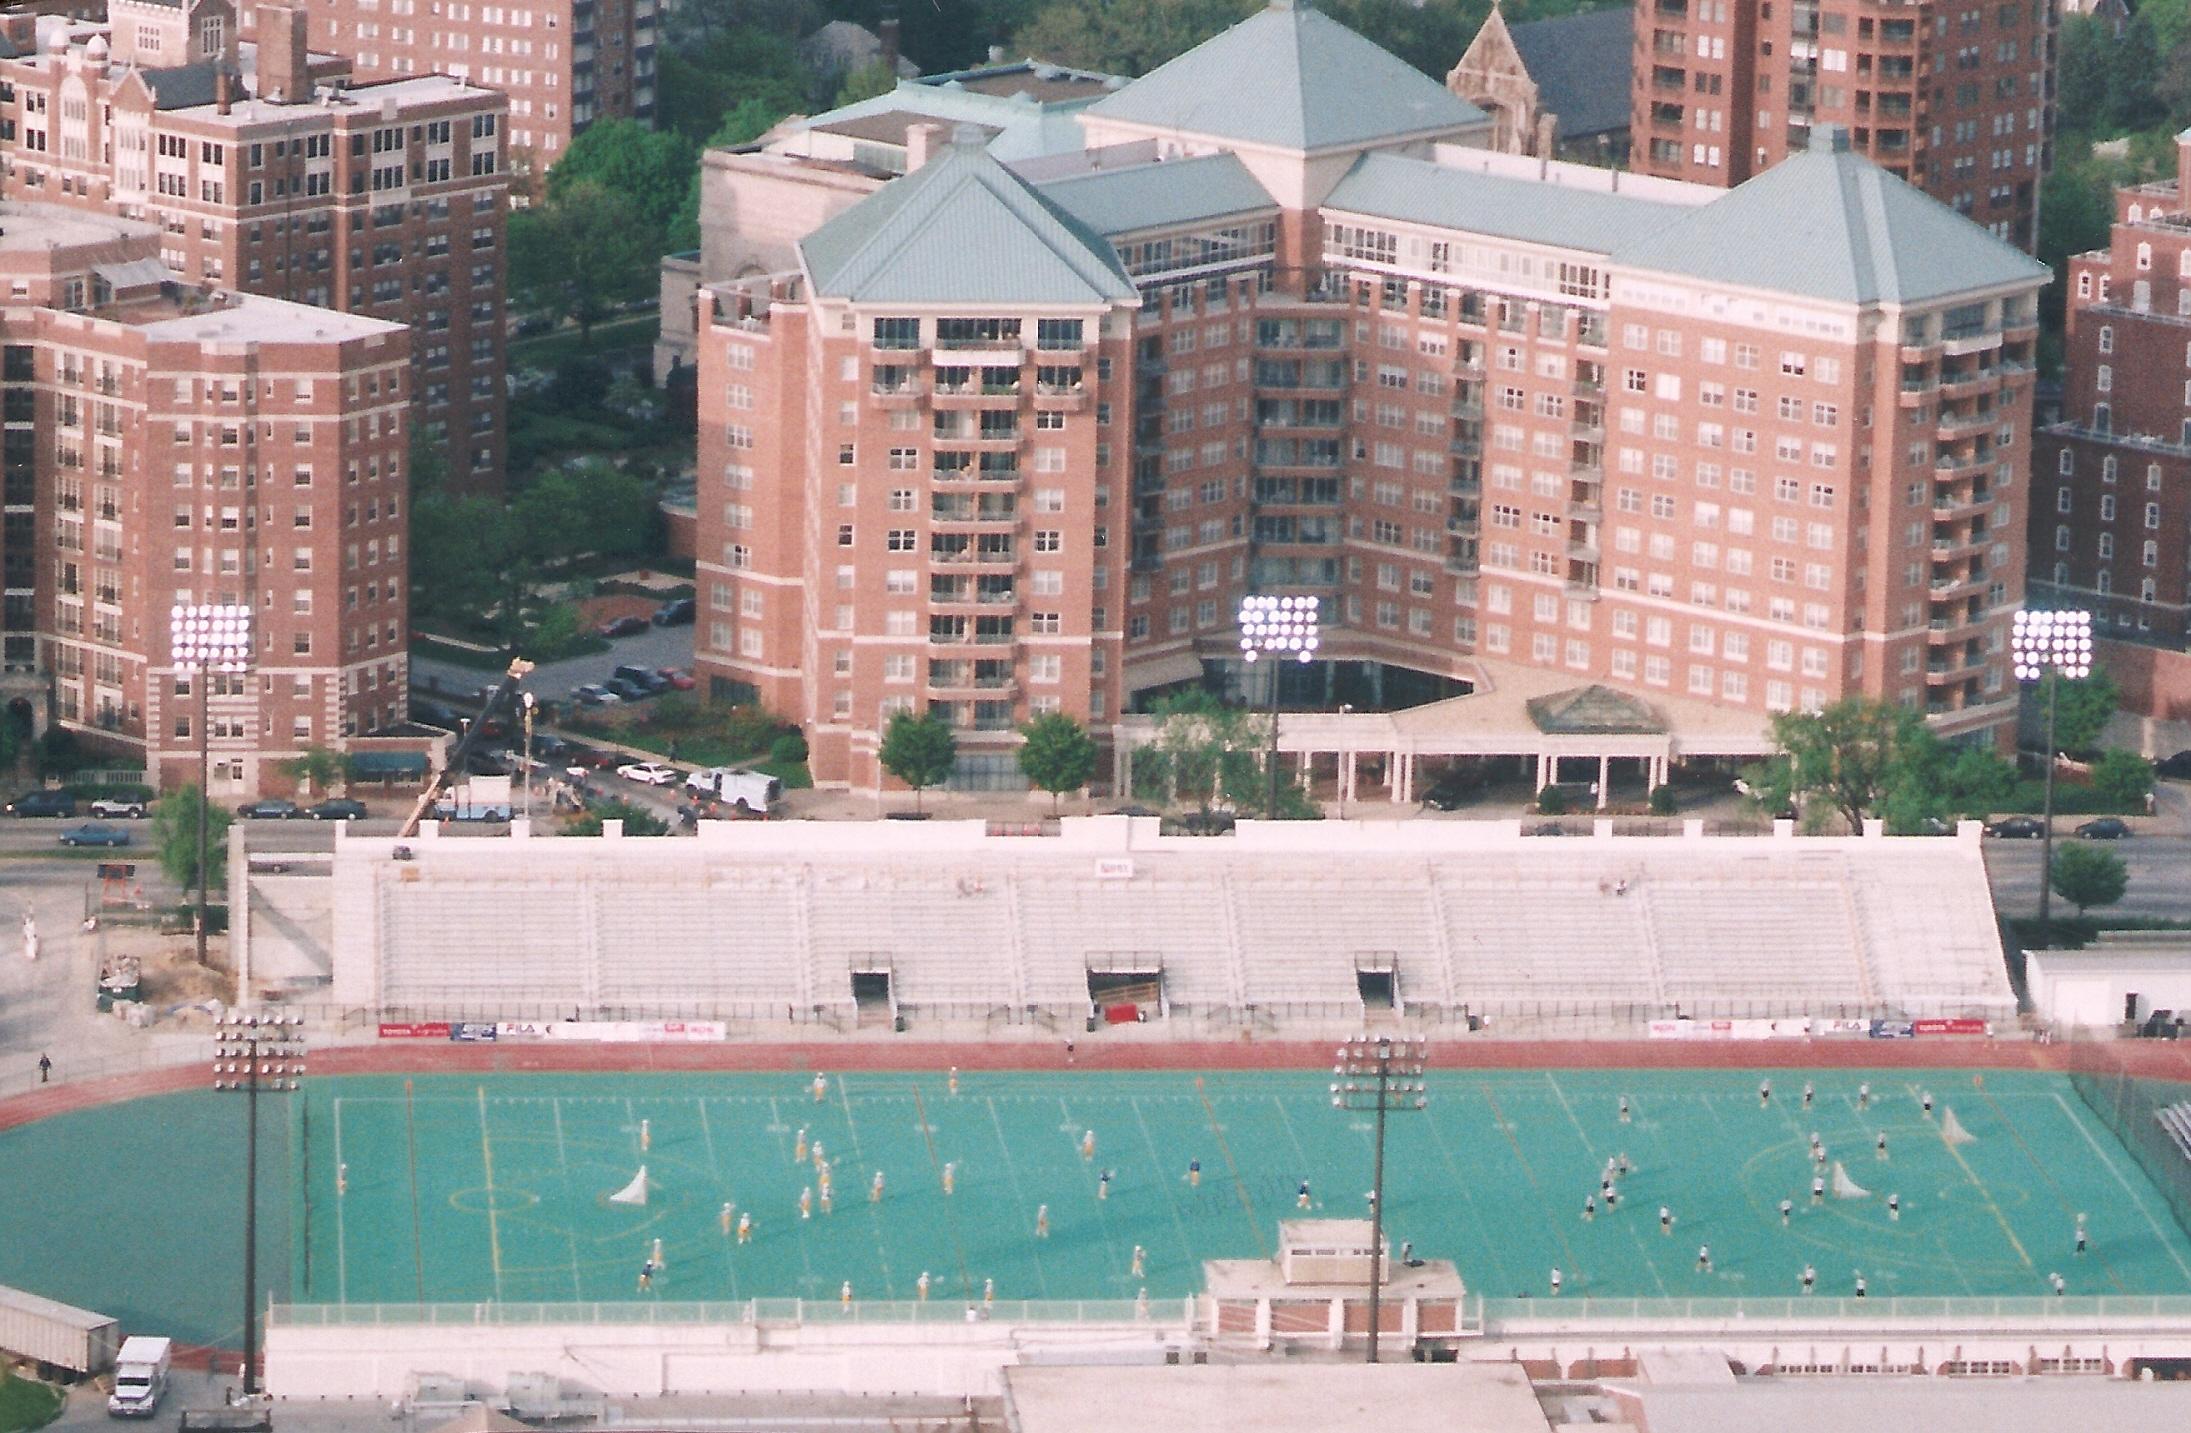 Johns Hopkins University Grandstand